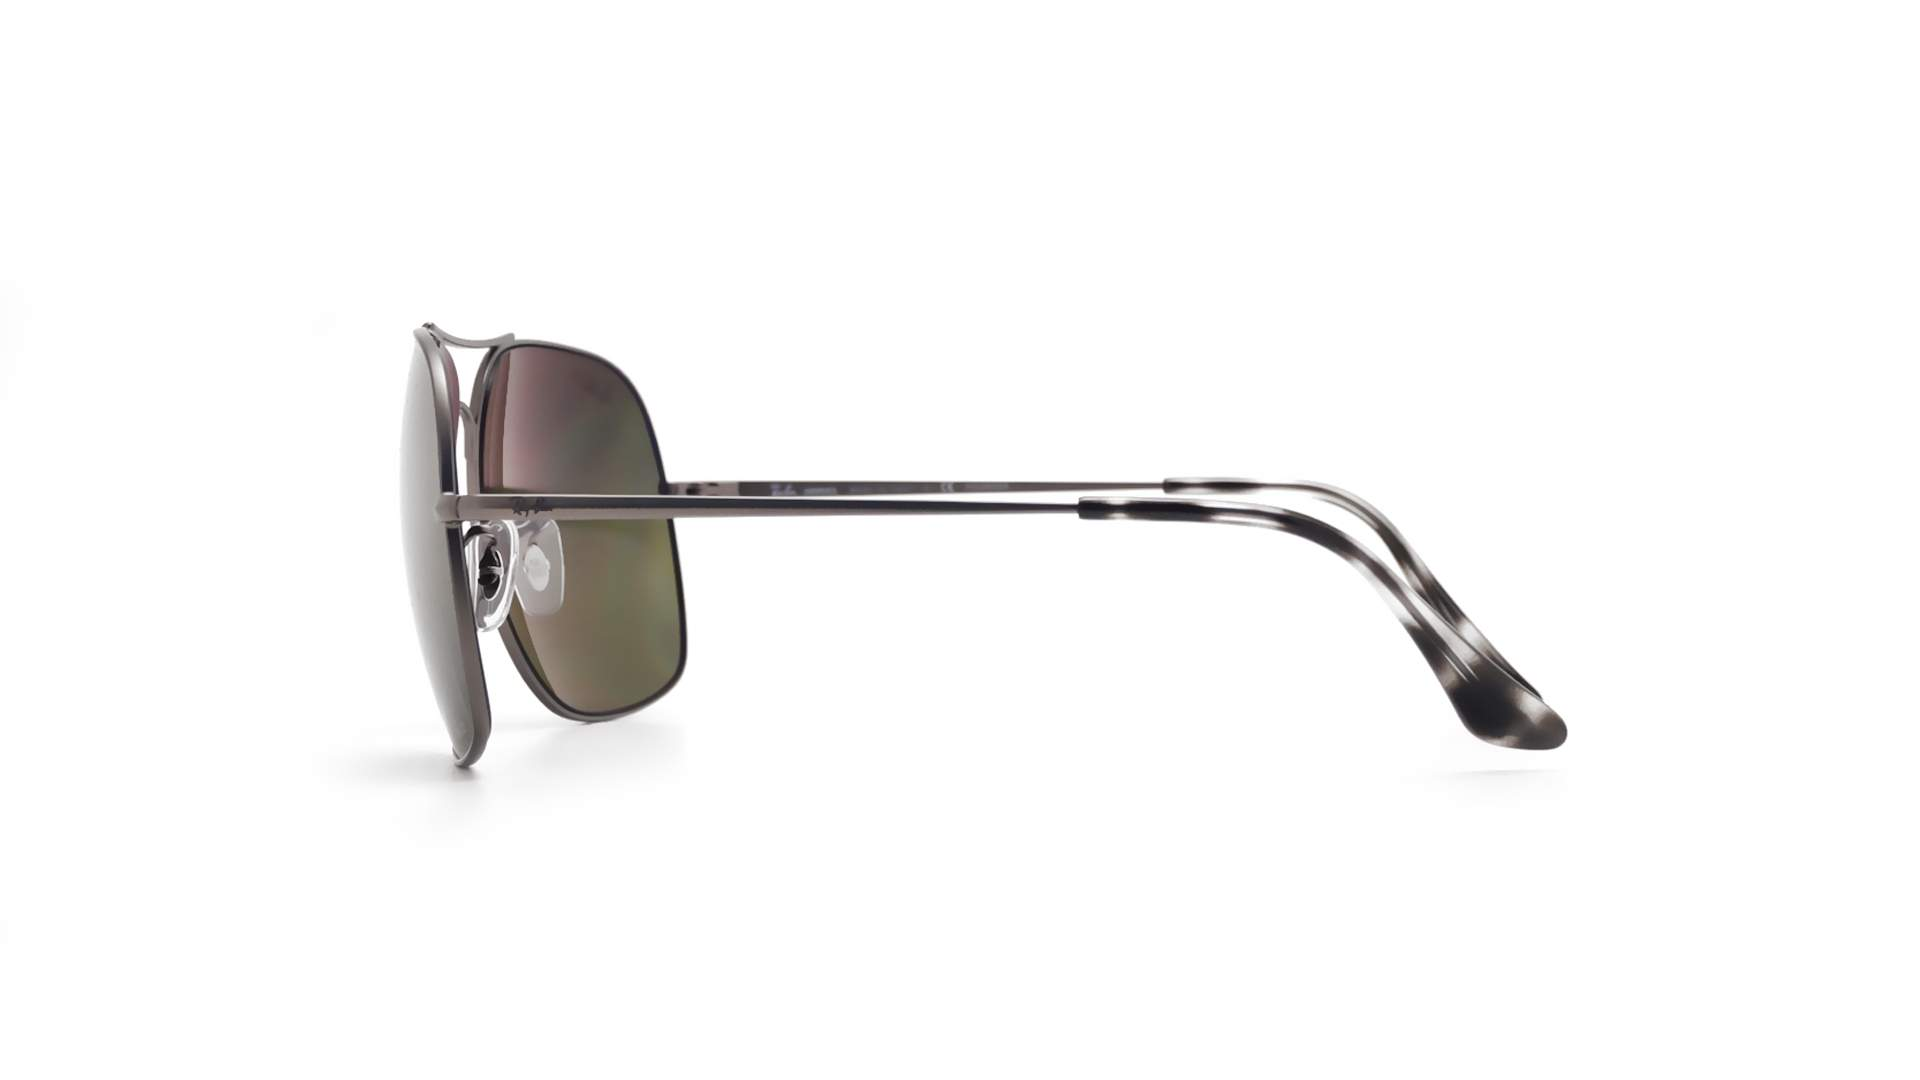 8fec7d060c1 Sunglasses Ray-Ban RB3587CH 029 6O 61-15 Silver Matte Chromance Large  Polarized Gradient Mirror